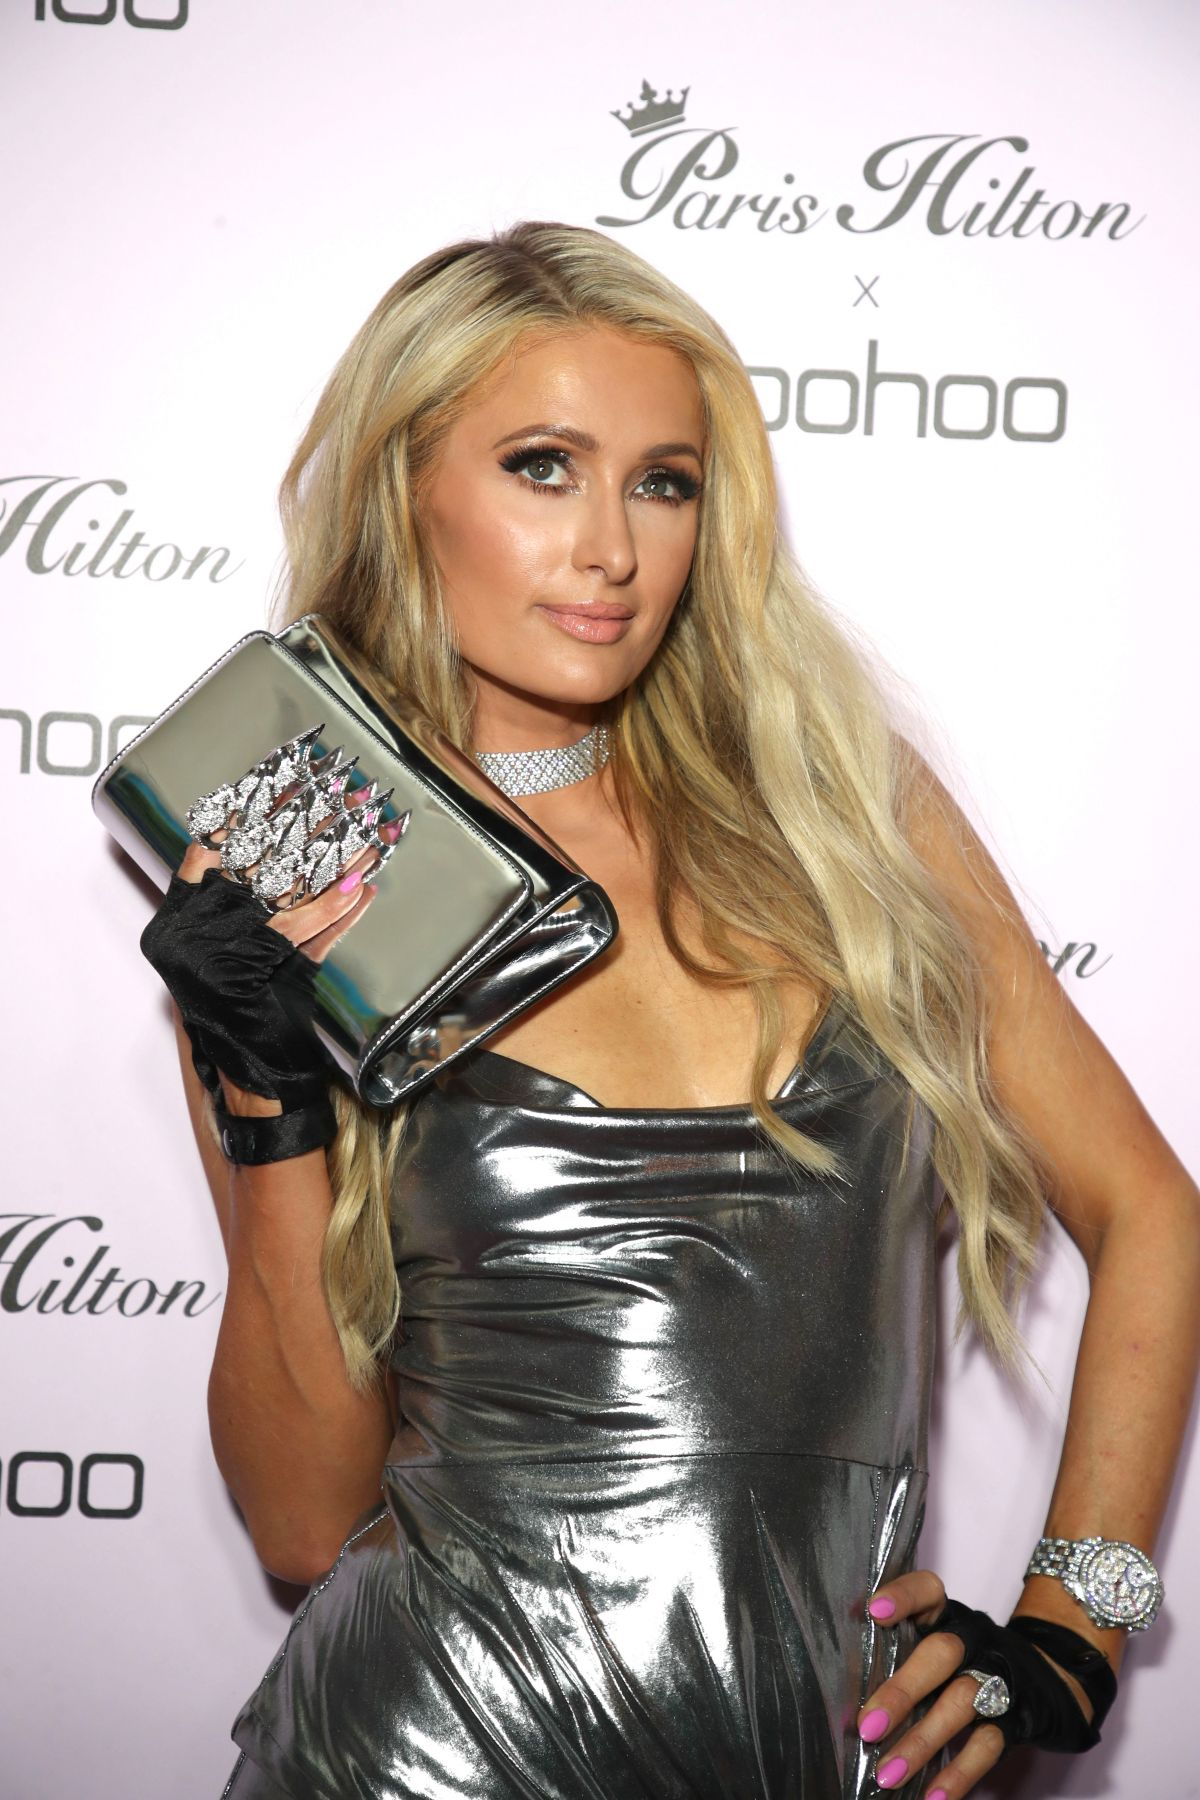 3b922443f4ae PARIS HILTON at Boohoo x Paris Hilton Launch Party in Los Angeles 06/20/2018